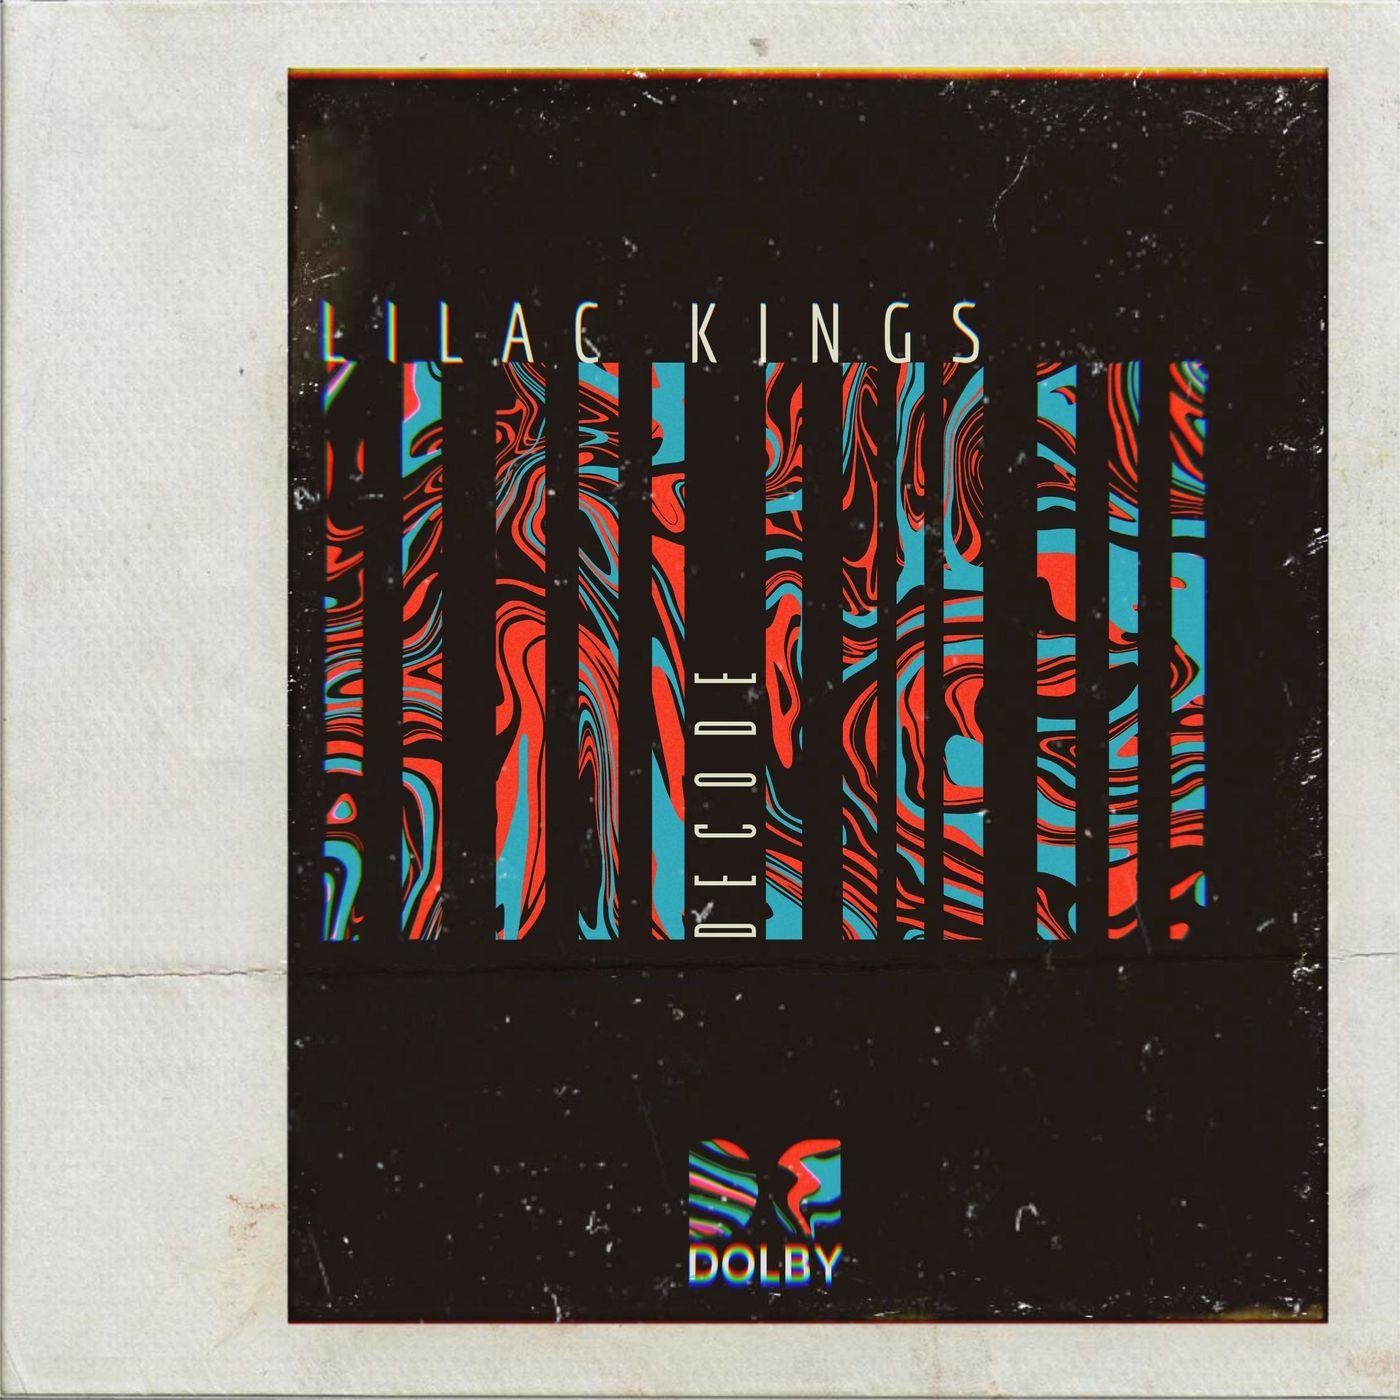 Lilac Kings - Decode [single] (2021)